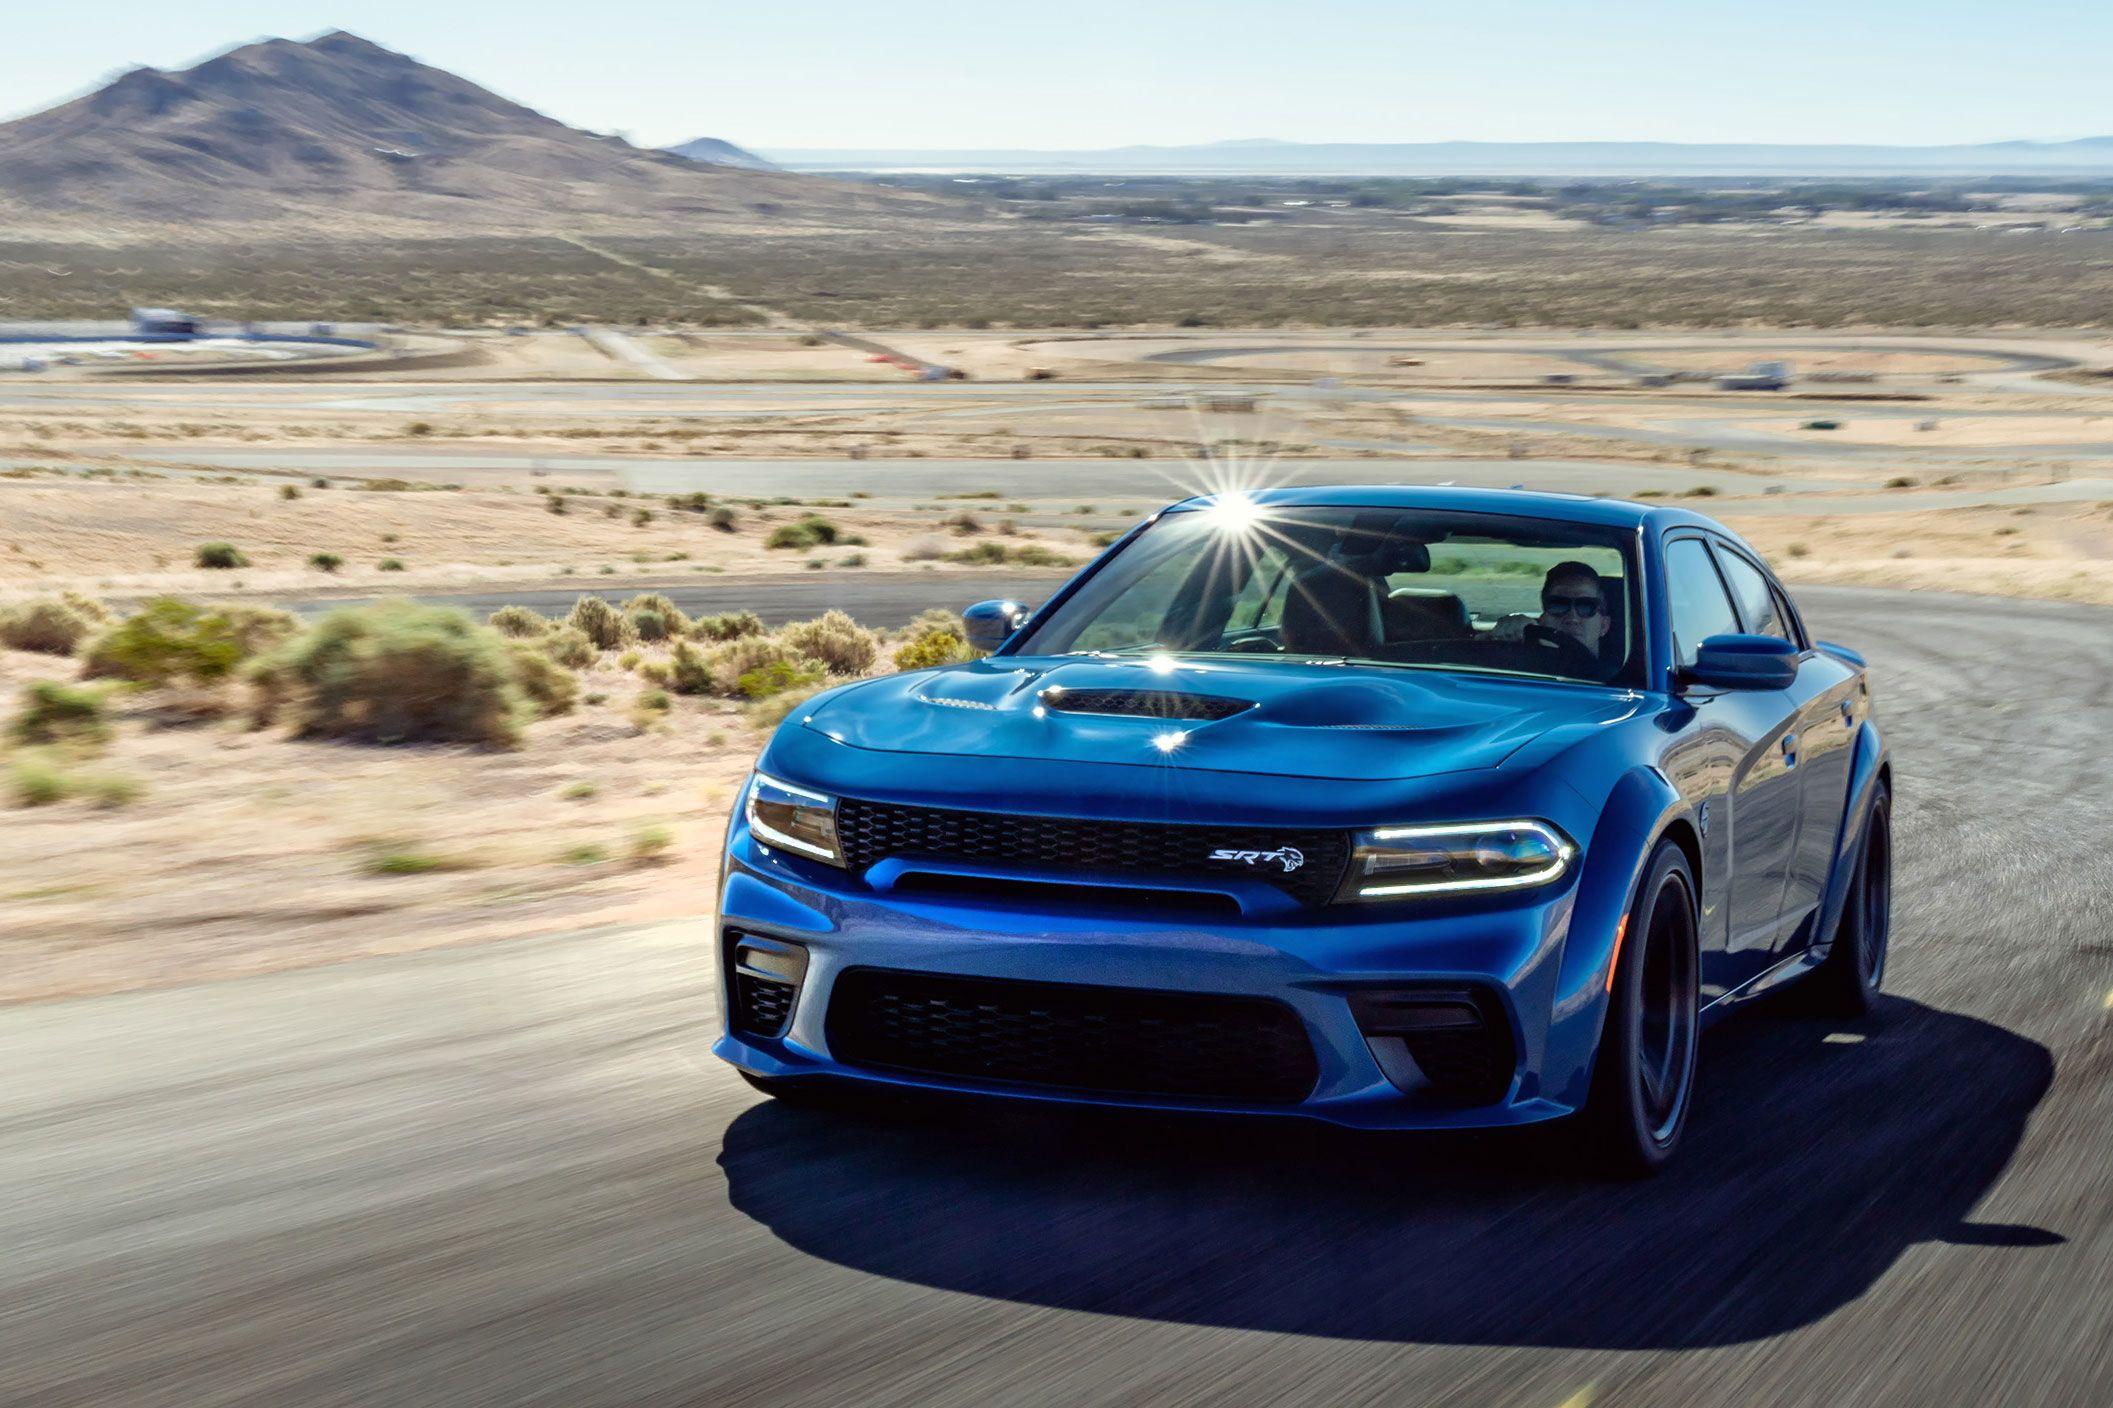 2019 Dodge Charger Hellcat 0-60 Engine Performance, Specs ...  |2020 Dodge Challenger Srt Hellcat